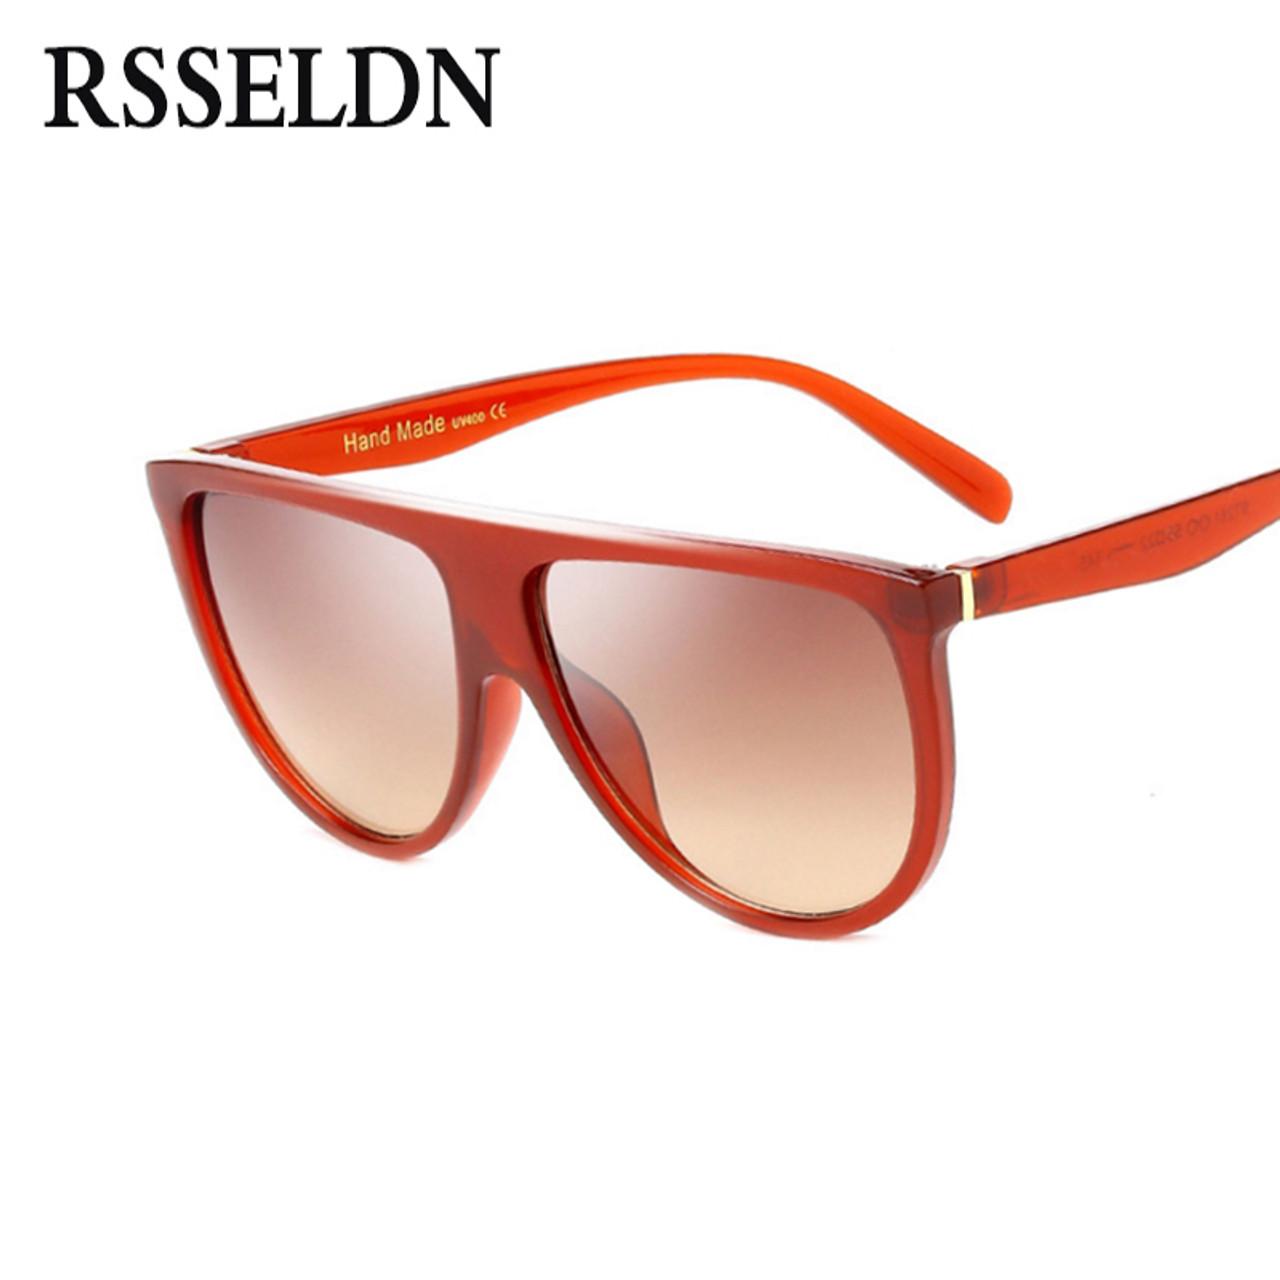 58f5ad767fc6 ... RSSELDN New Black Clear Oversized Square Sunglasses Women Gradient 2018  Summer Style Classic Women Sun glasses ...